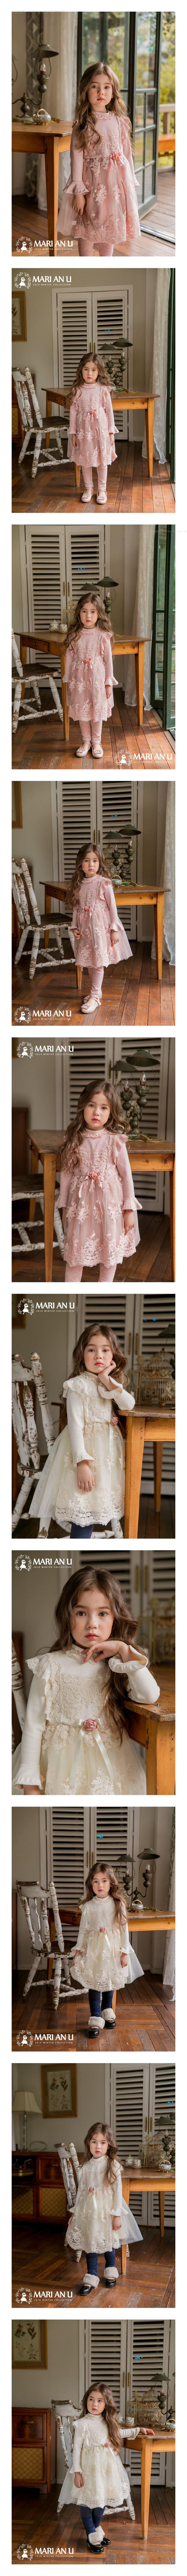 MARI AN U - Korean Children Fashion - #Kfashion4kids - Marie One-piece